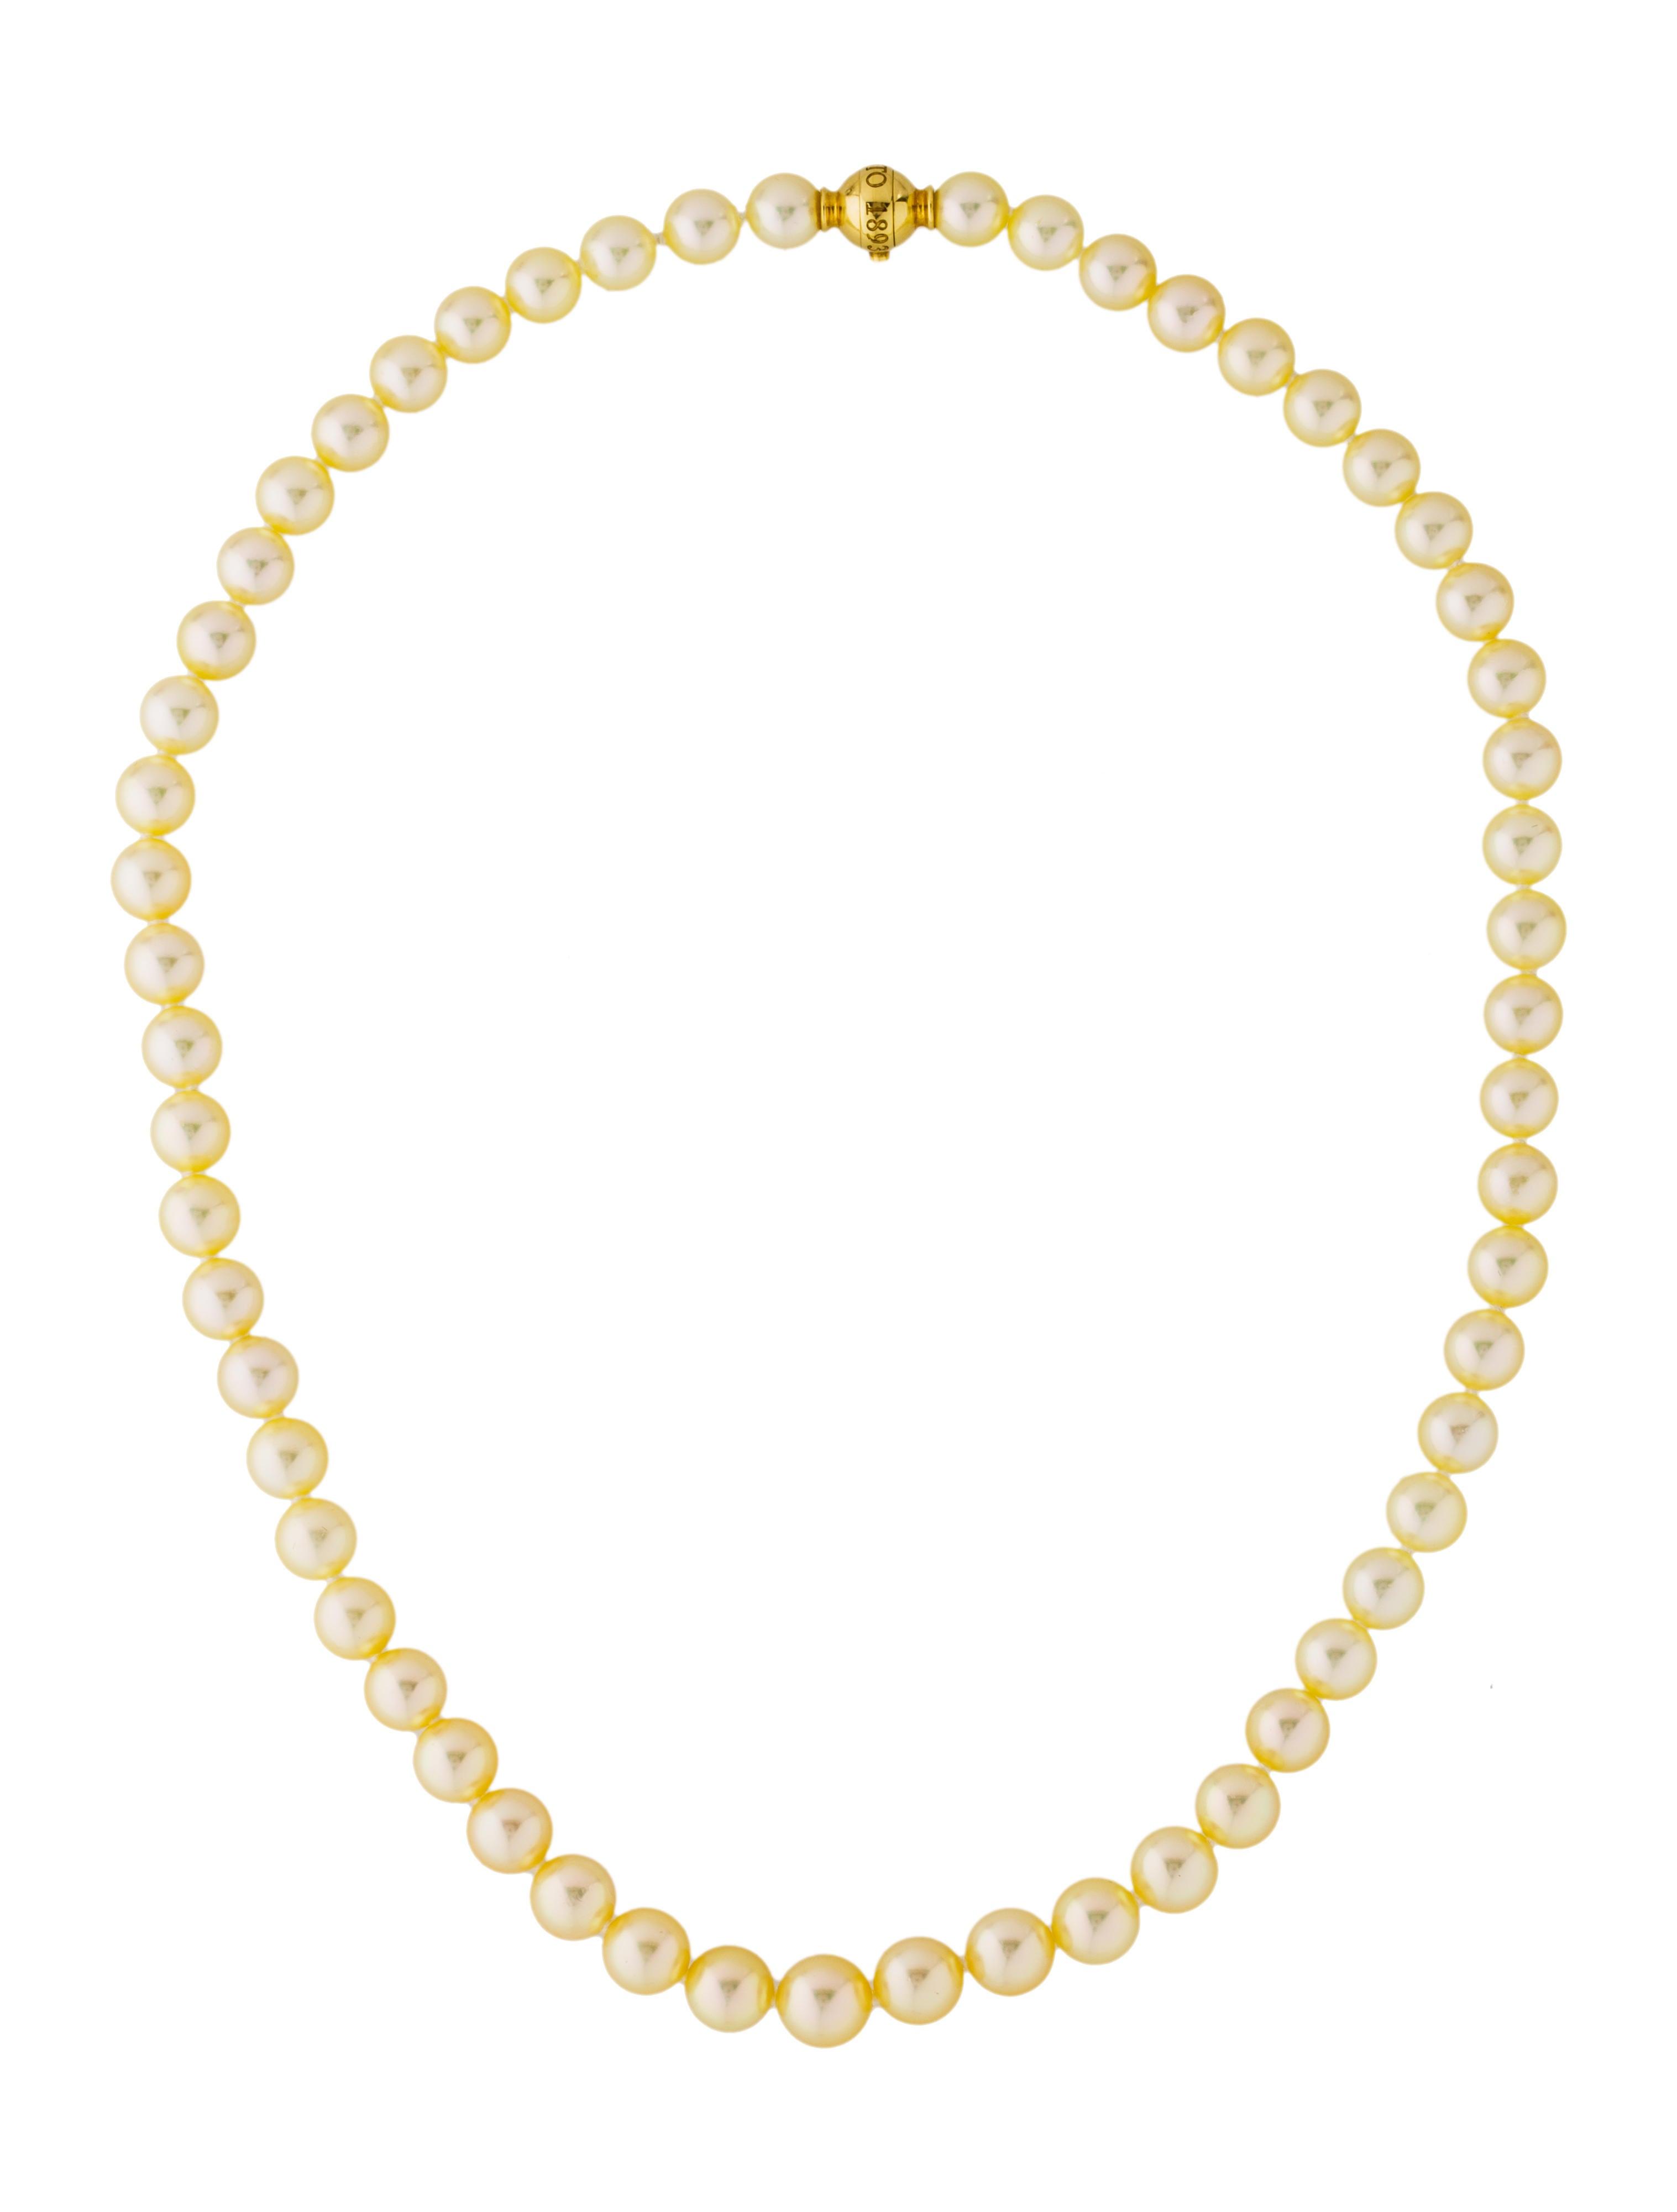 mikimoto 18k akoya cultured pearl graduated bead necklace